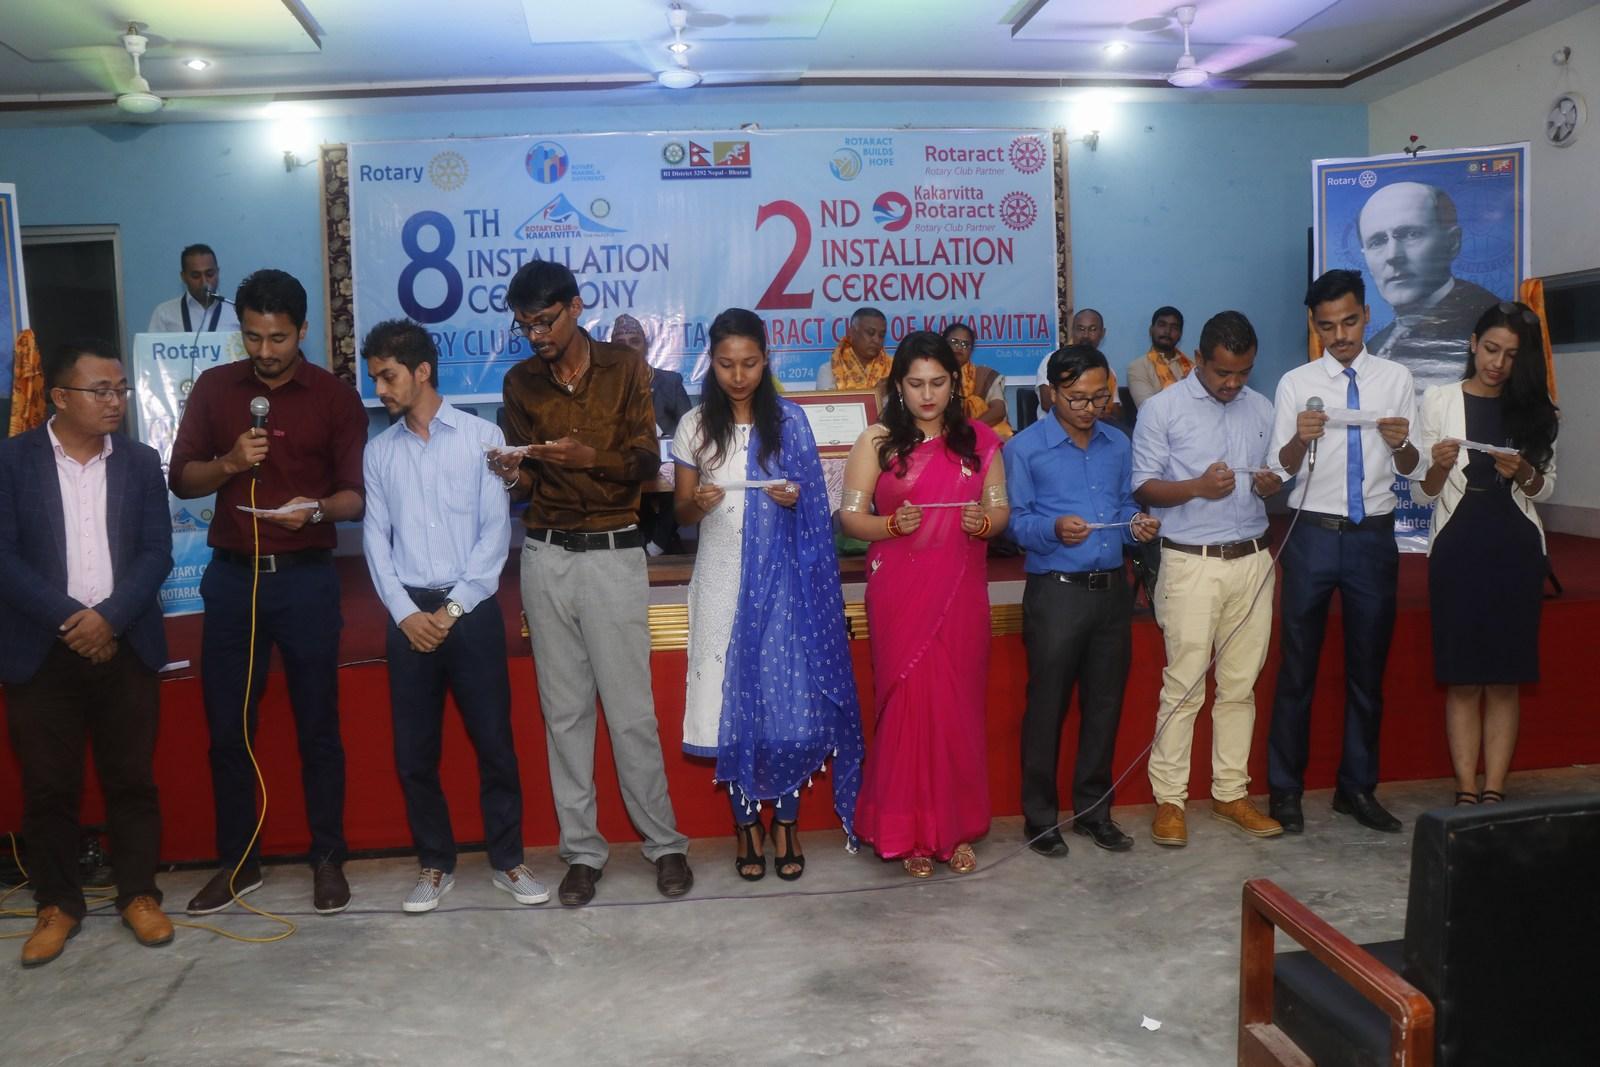 8th-Installation-Ceremony-Rotary-Club-of-Kakarvitta-68